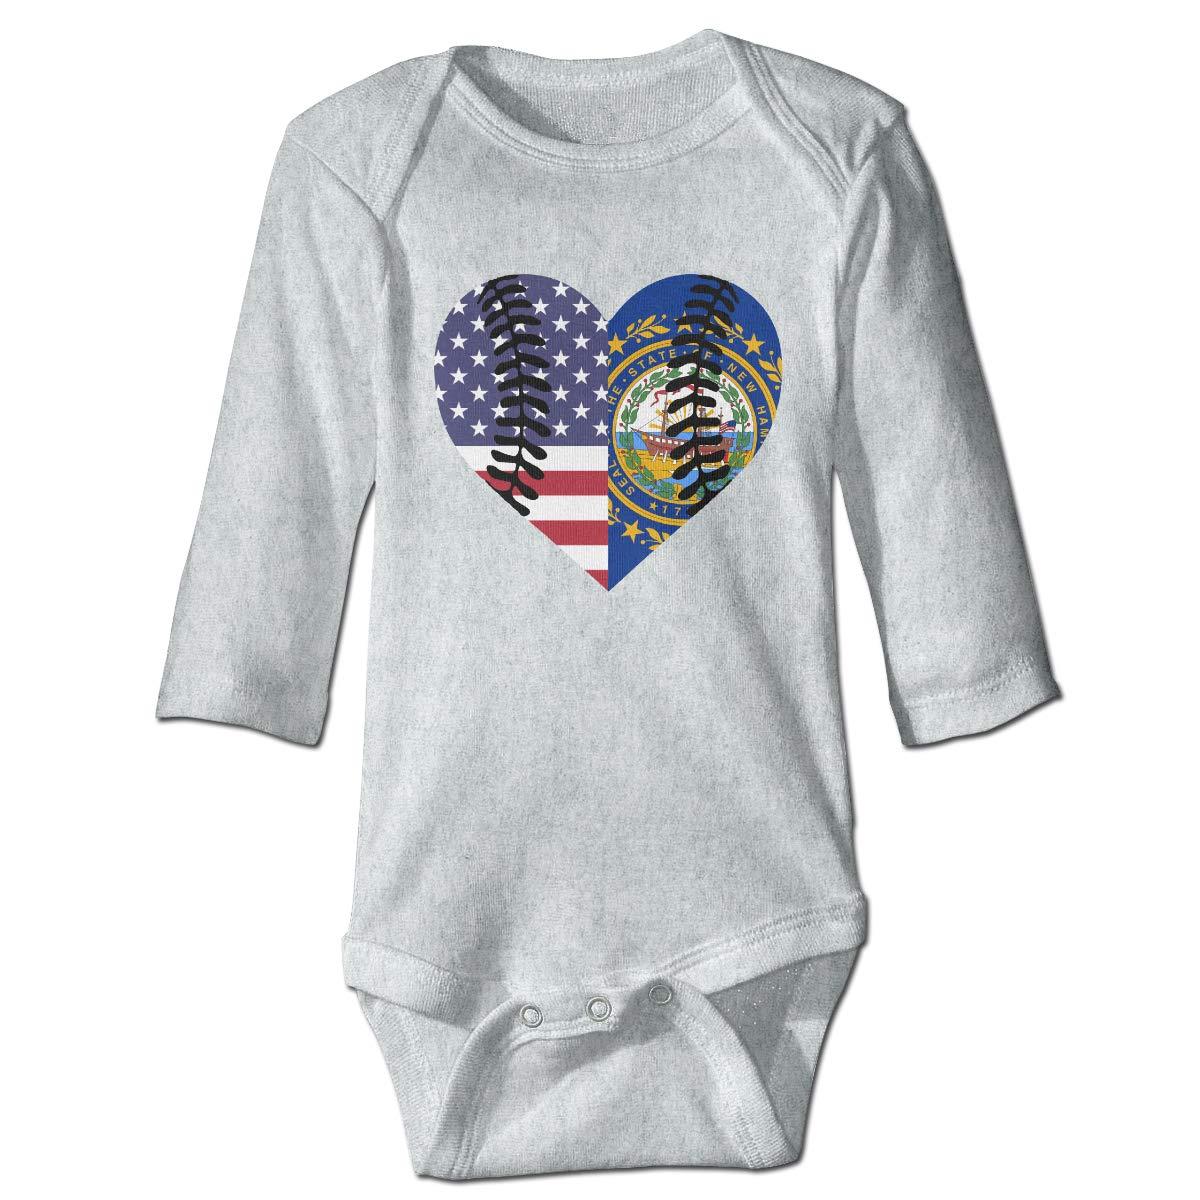 A14UBP Baby Infant Toddler Long Sleeve Climb Jumpsuit New Hampshire USA Flag Half Baseball Unisex Playsuit